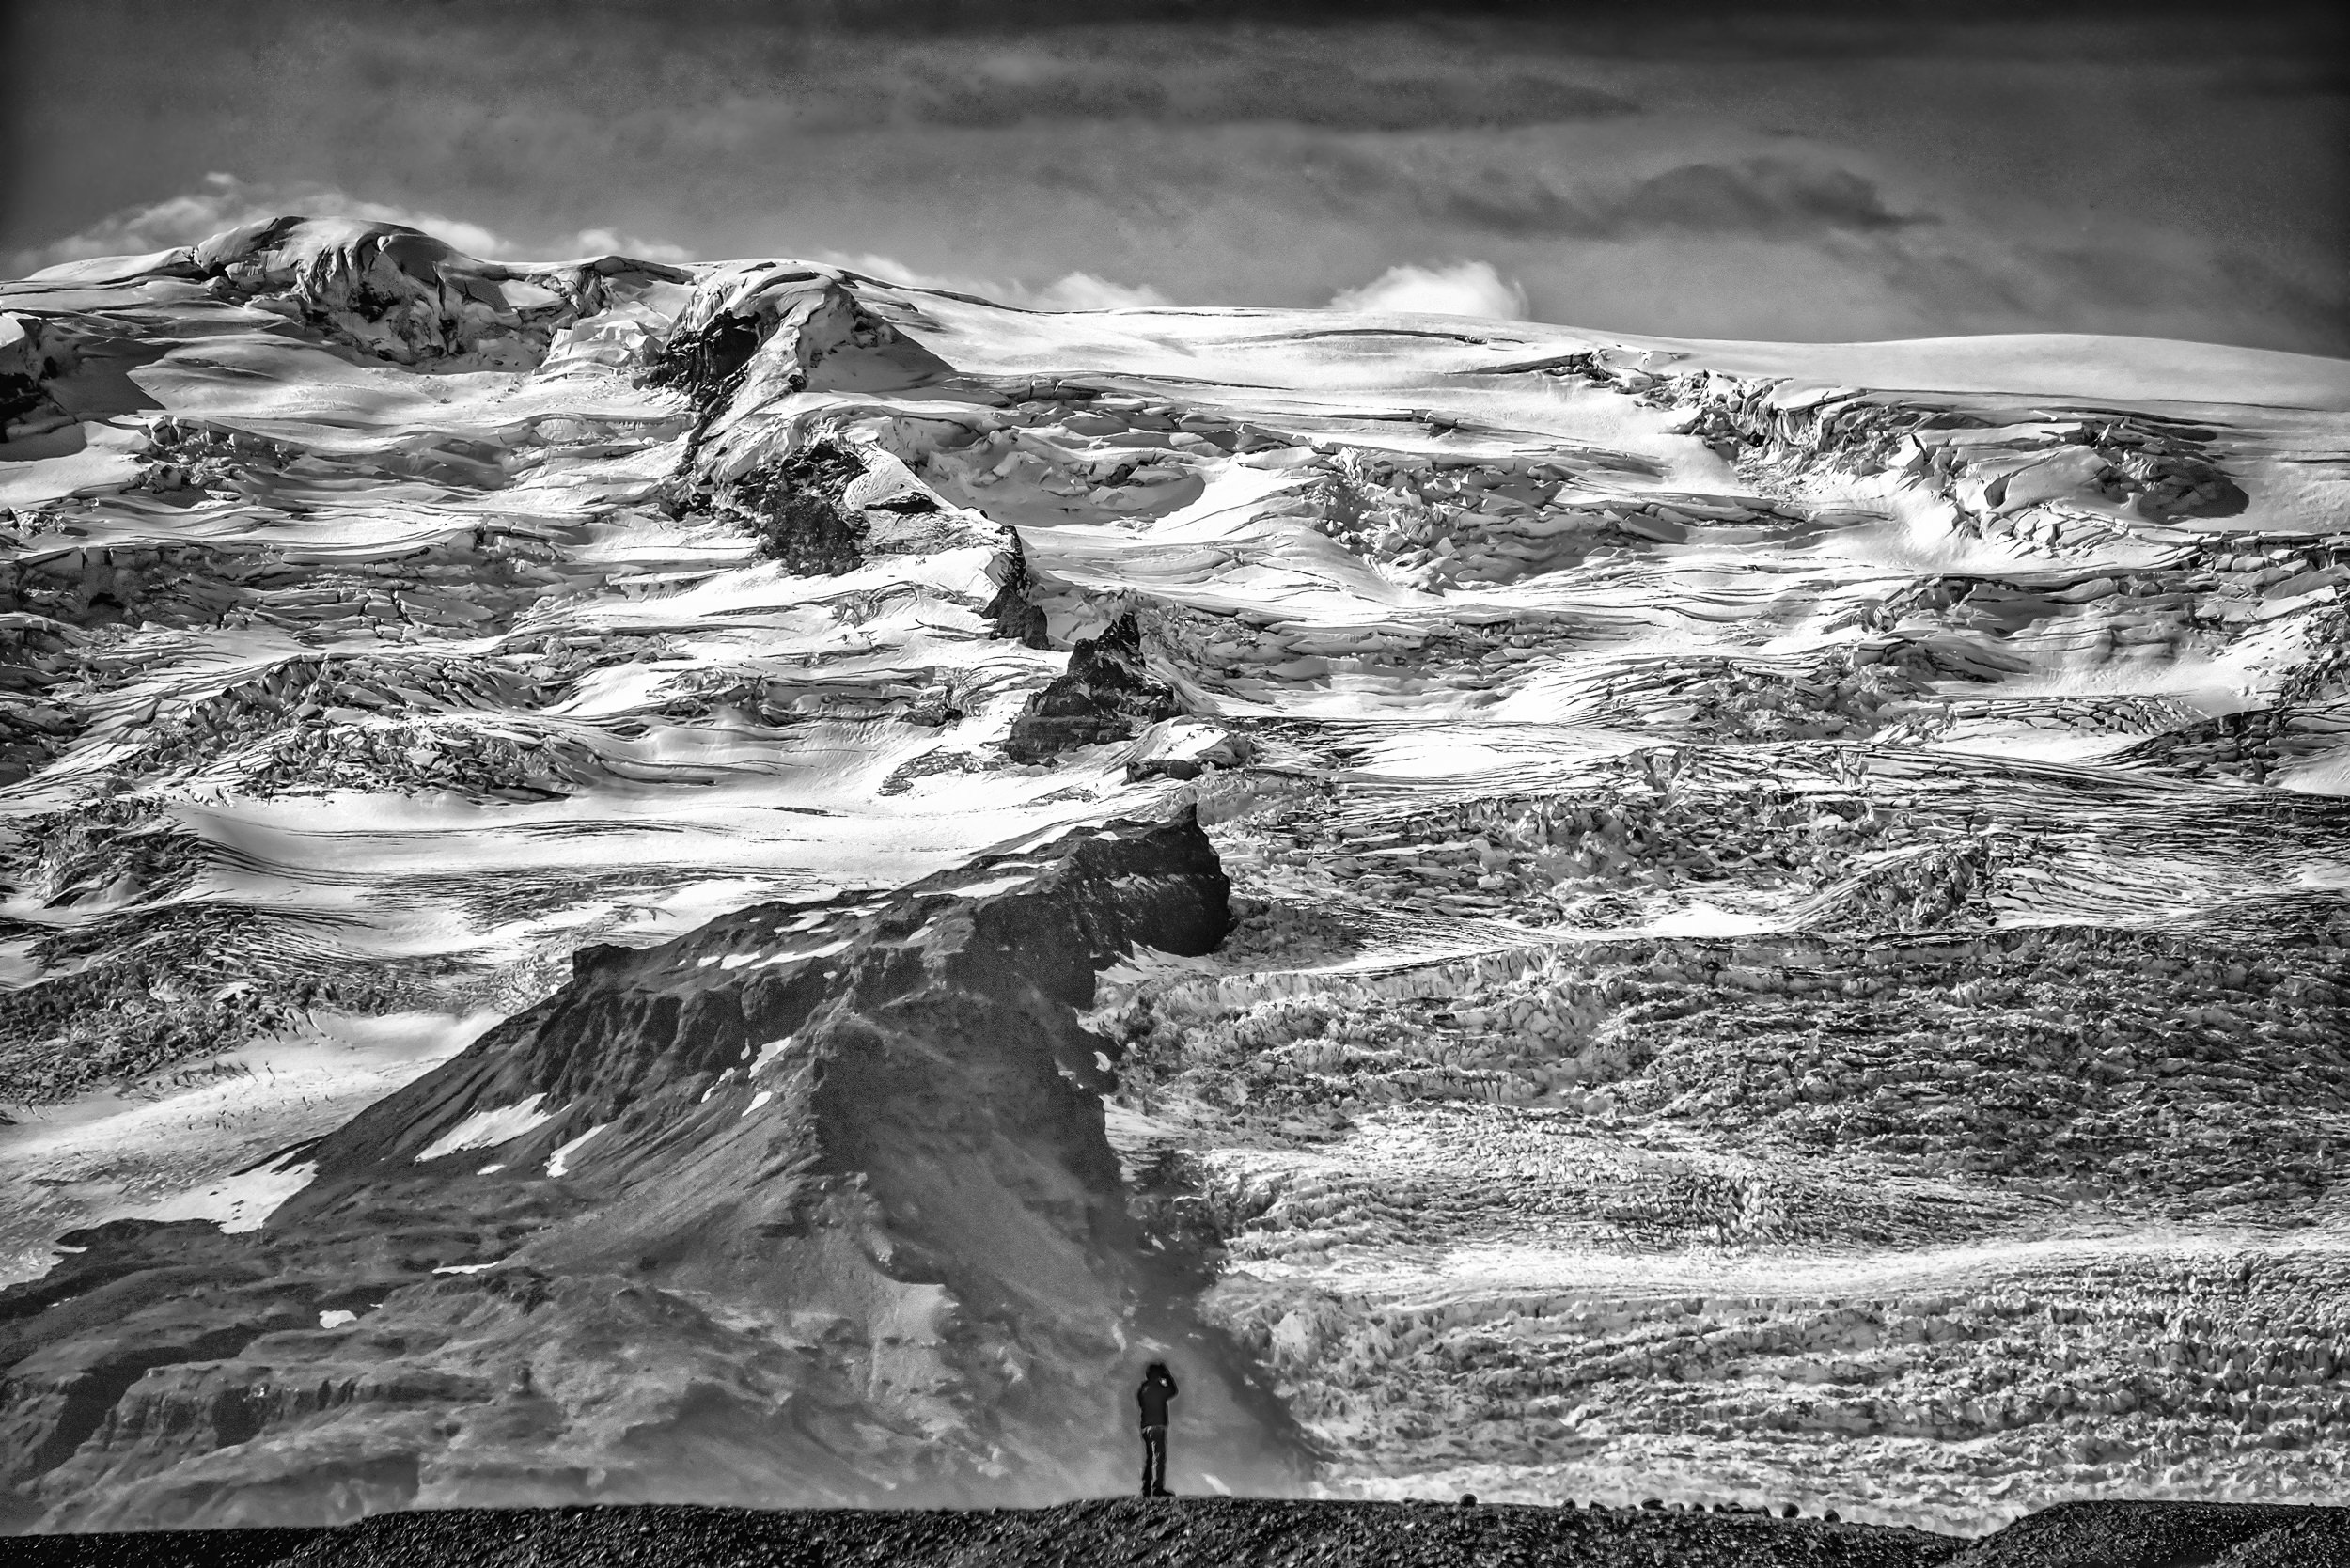 [2012 08 12] Iceland Vatnajokul Glacier NIKON D800 (1791) - BW 16x11-Edit-Edit.jpg